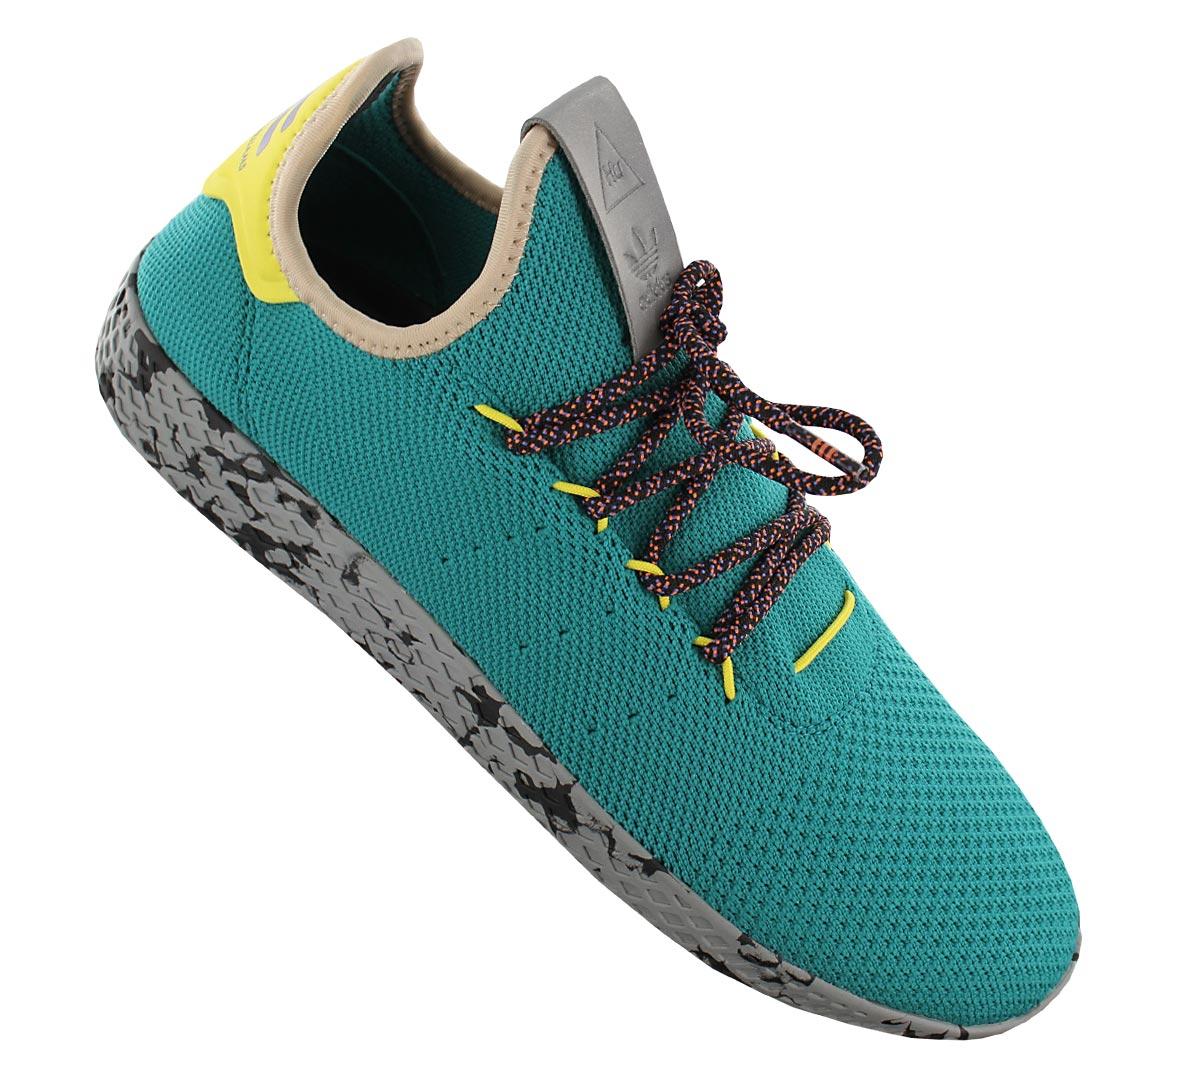 814f2f5ae Adidas Pharrell Williams Pw Tennis Hu Trainers Shoes Cq1872 Sports ...